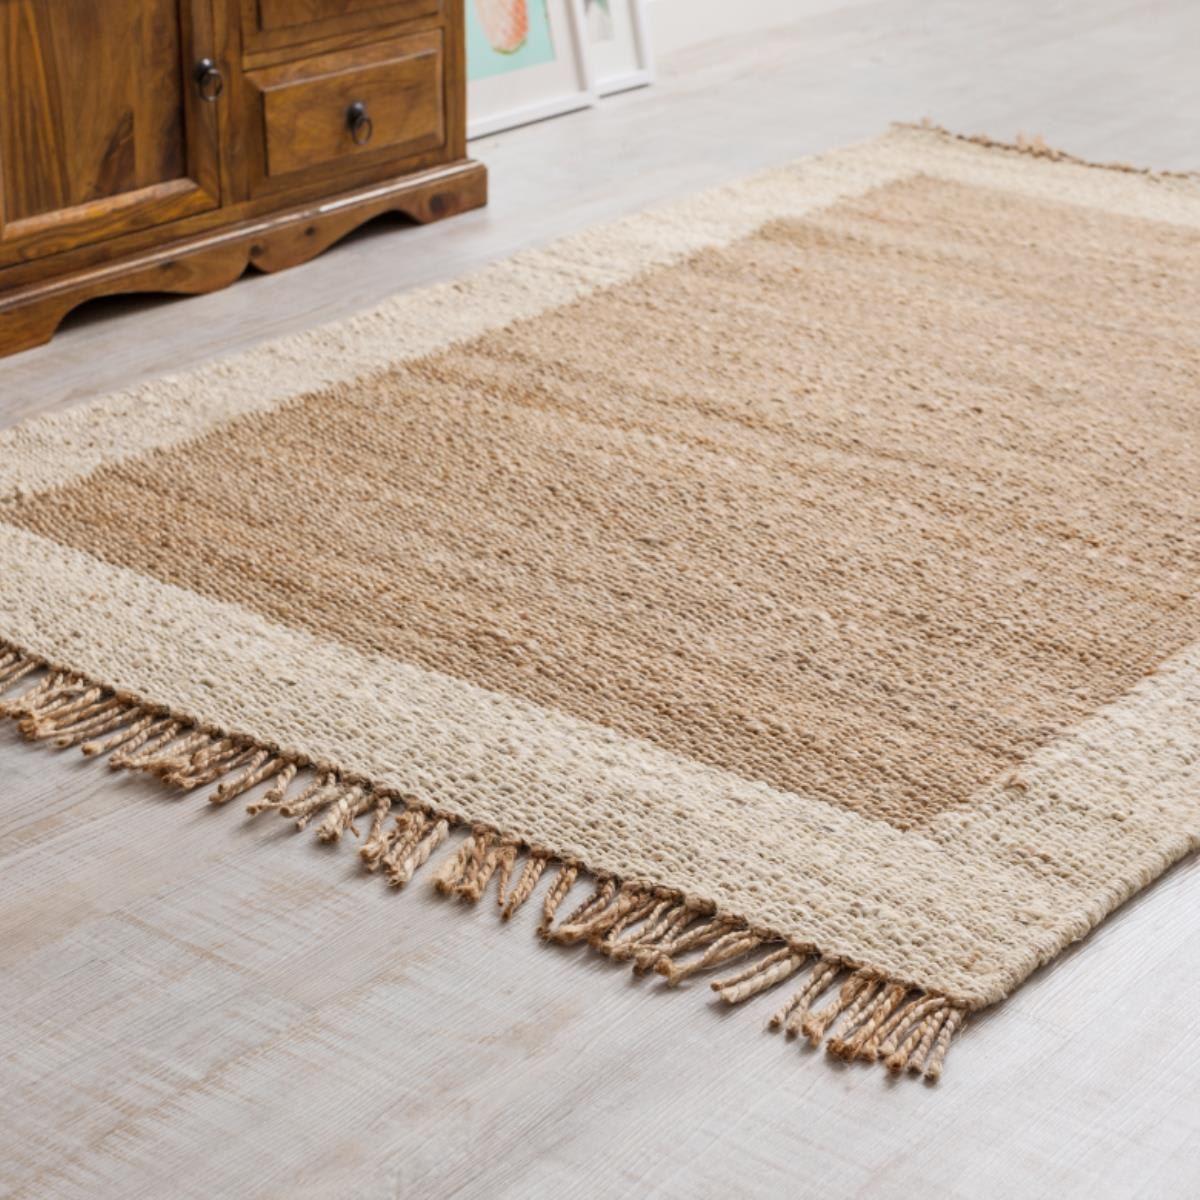 Border Jute Rug Myakka Co Uk Jute Rug Jute Carpet Large Jute Rug